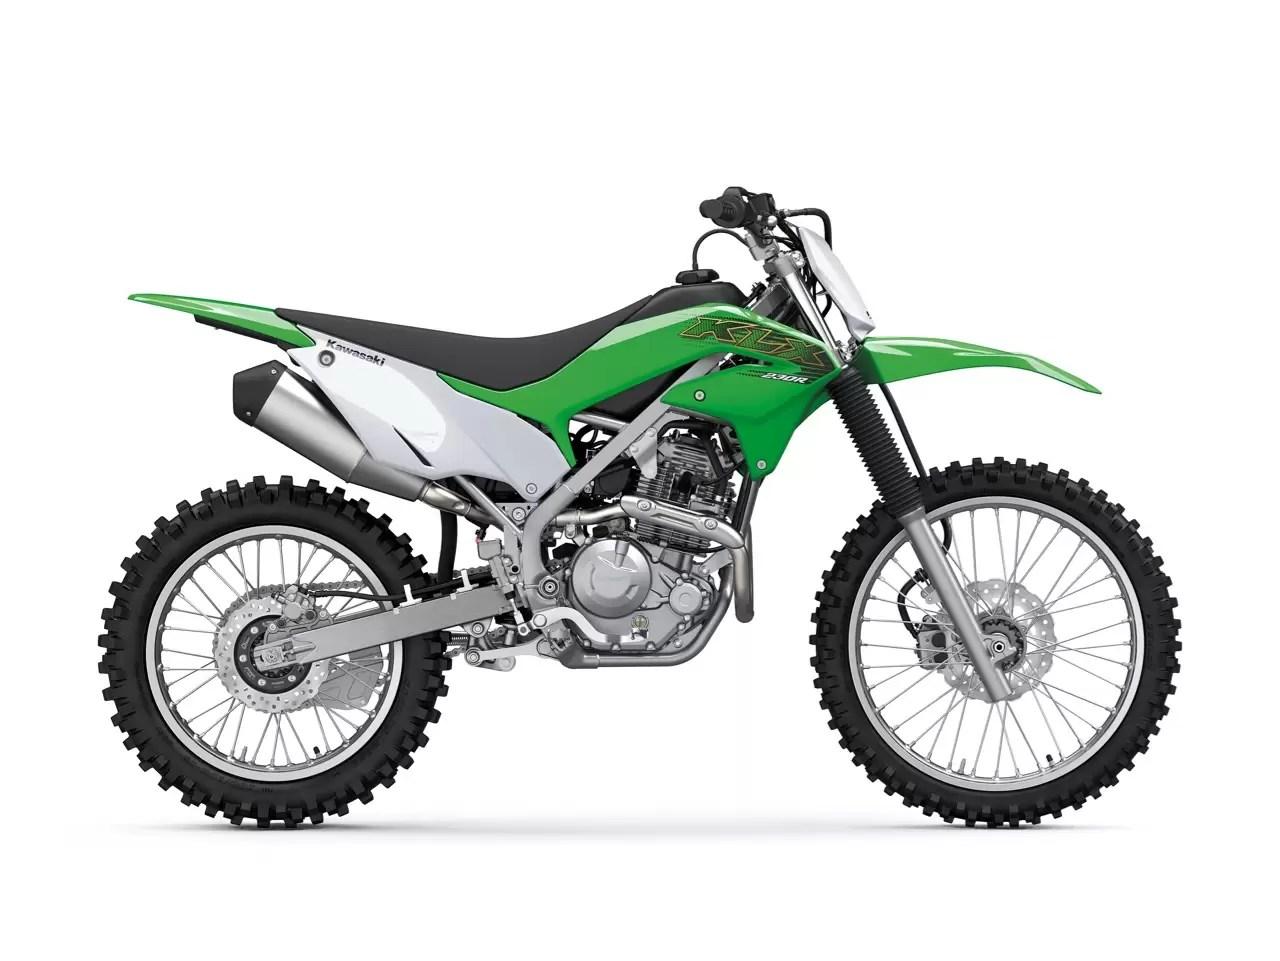 Kawasaki Off Road Models Revealed New Klx300r